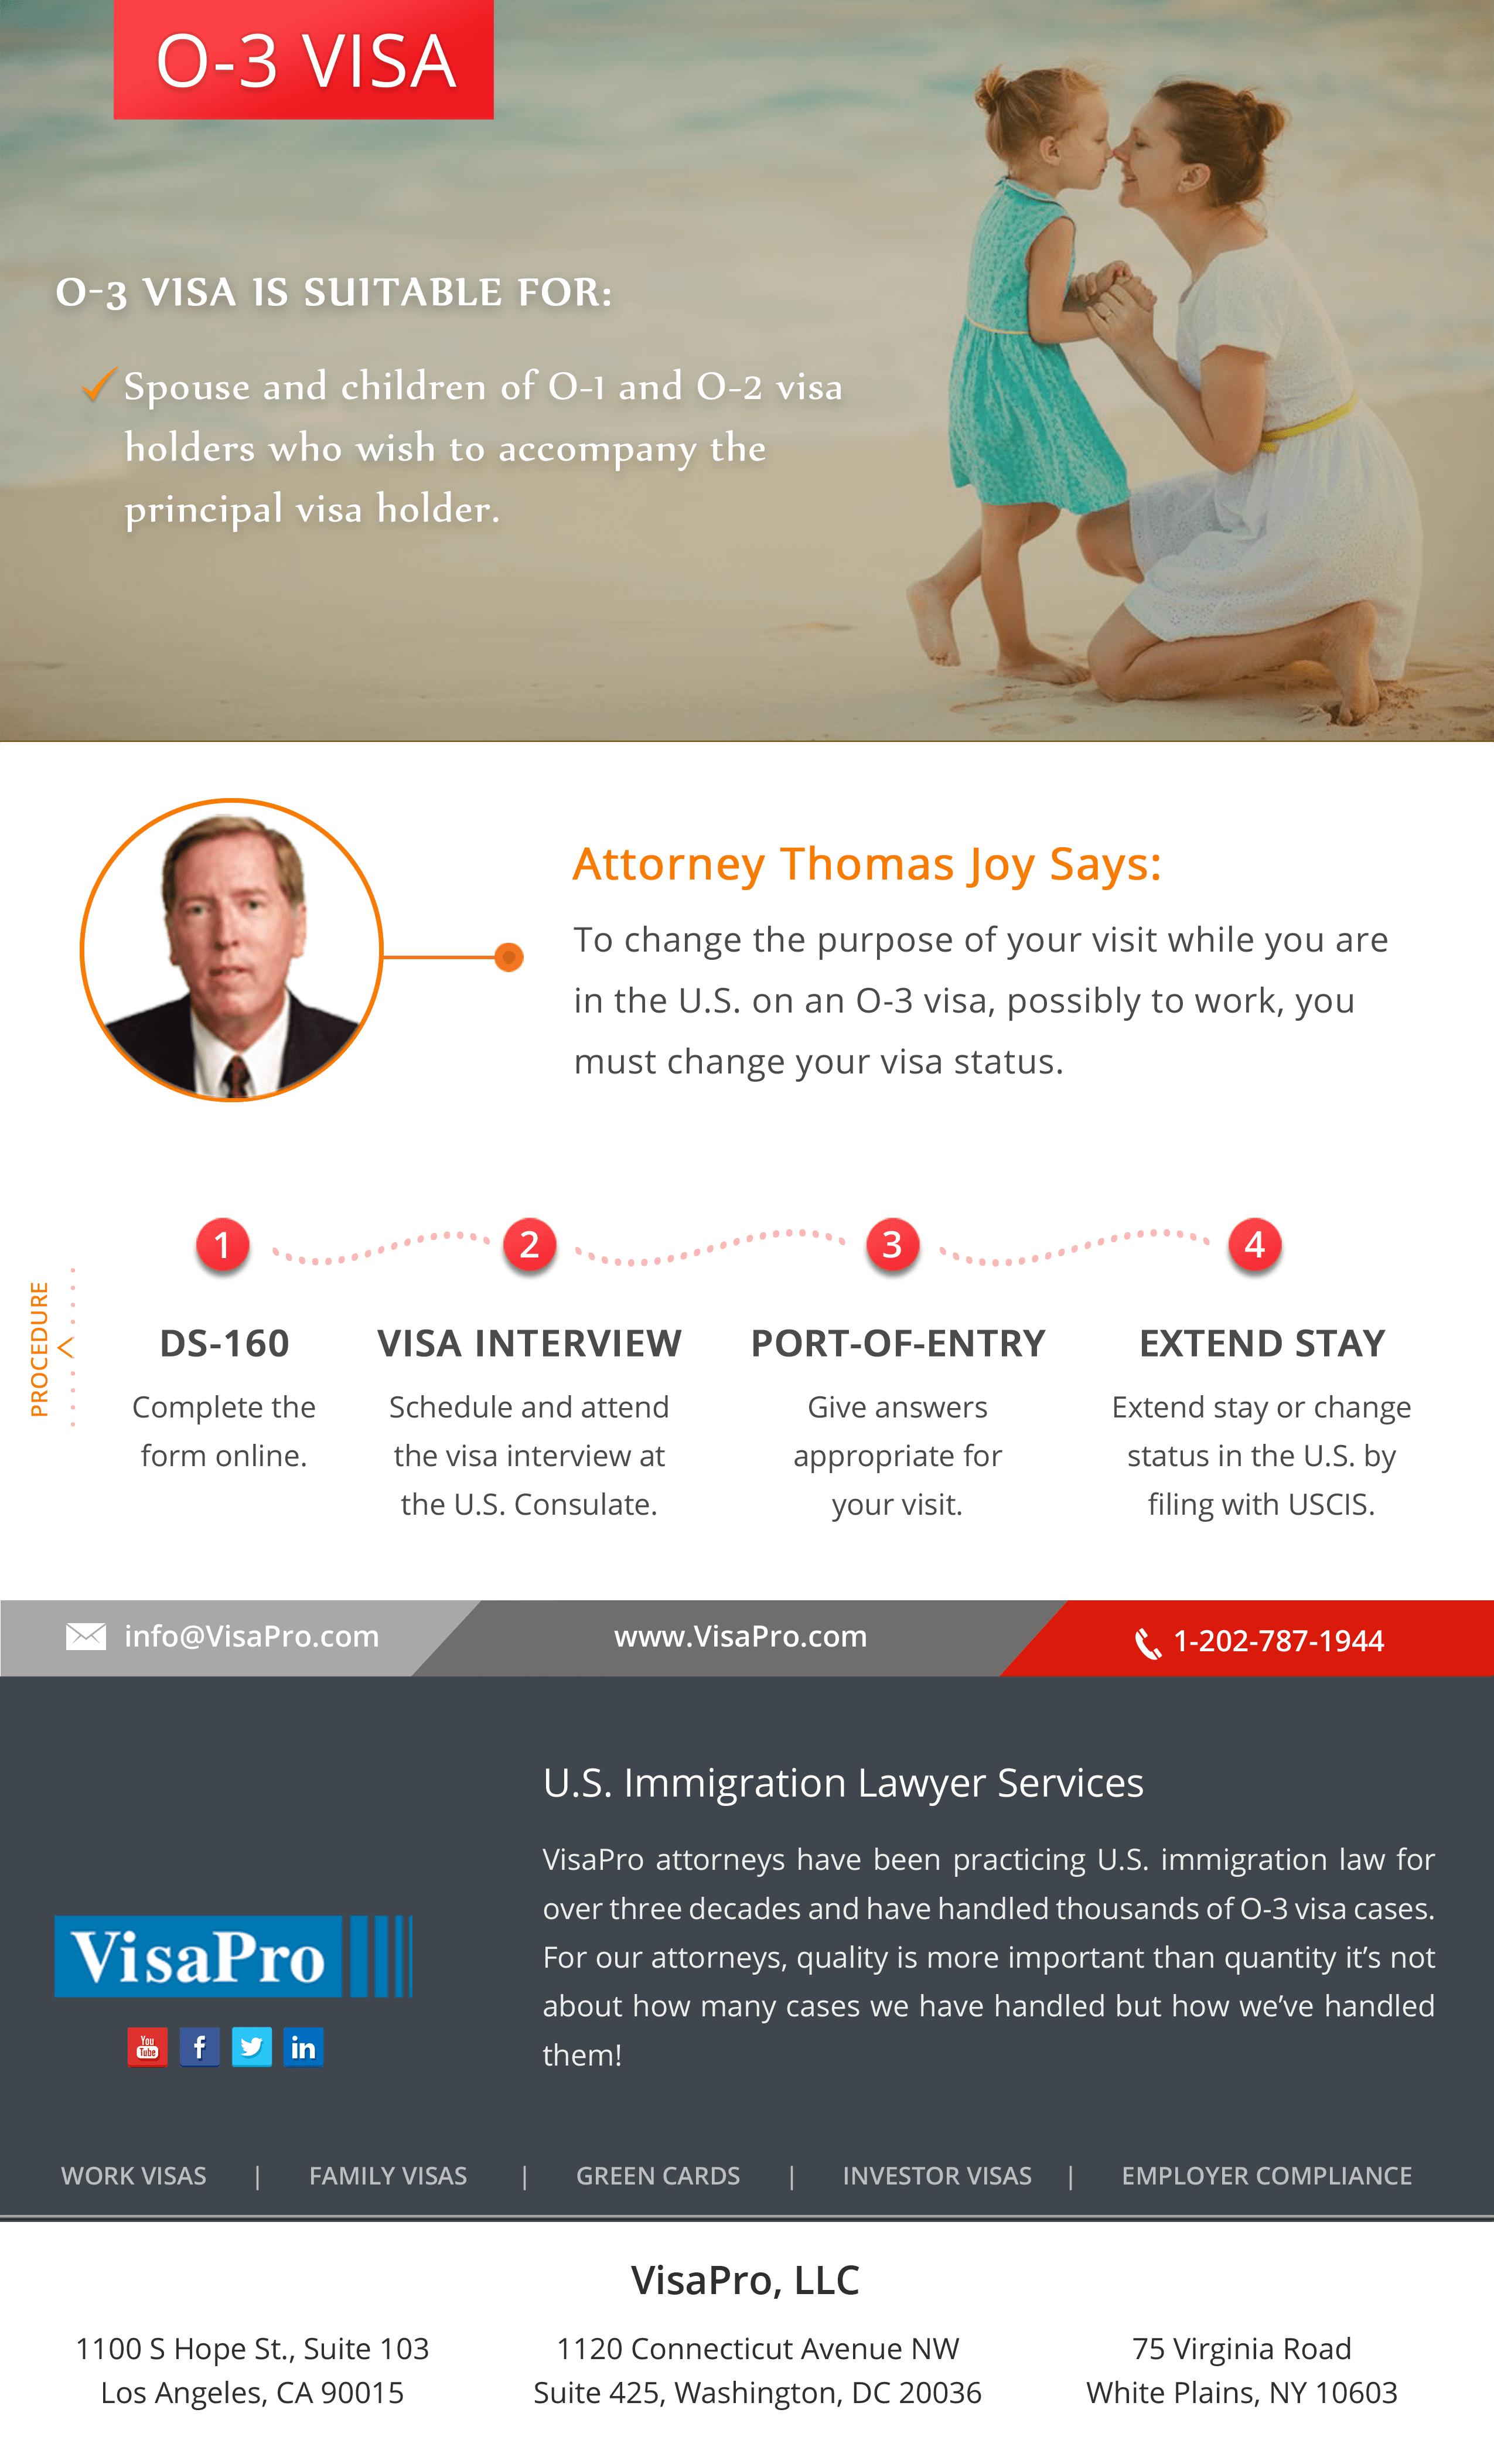 O3 Visa Work Permit - Follow these easy steps